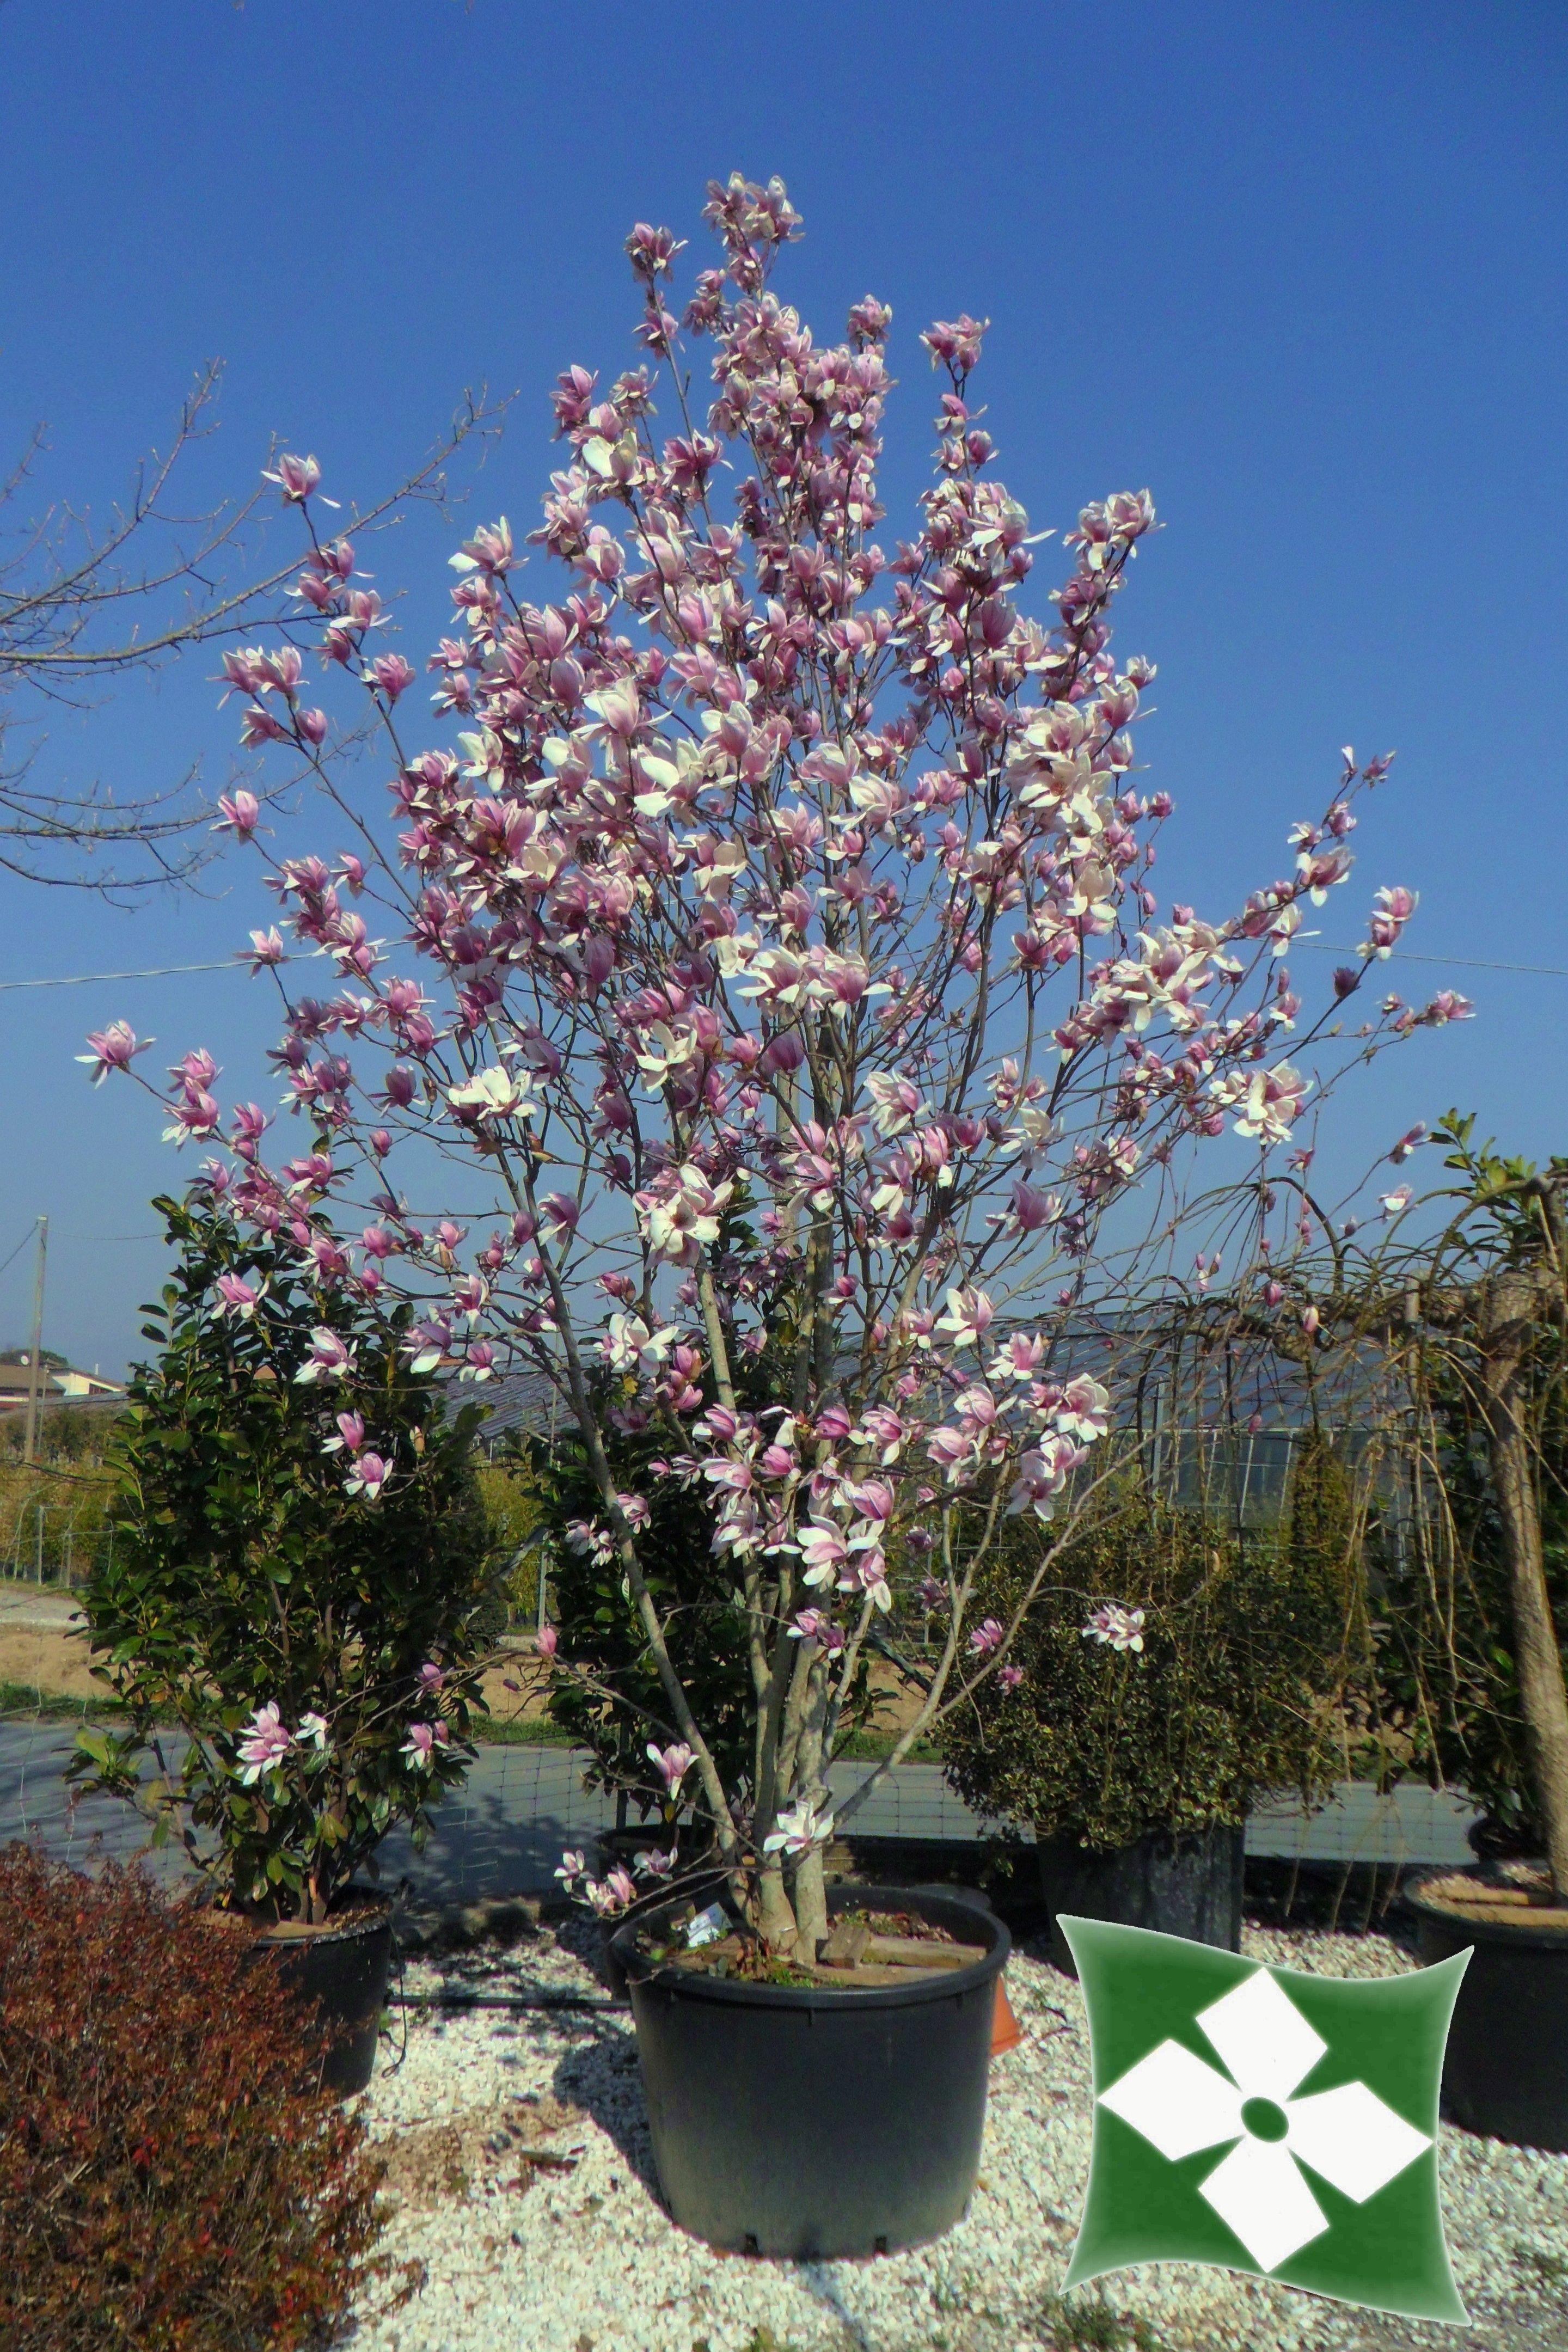 magnolia x soulangeana magnolia a foglia caduca. Black Bedroom Furniture Sets. Home Design Ideas